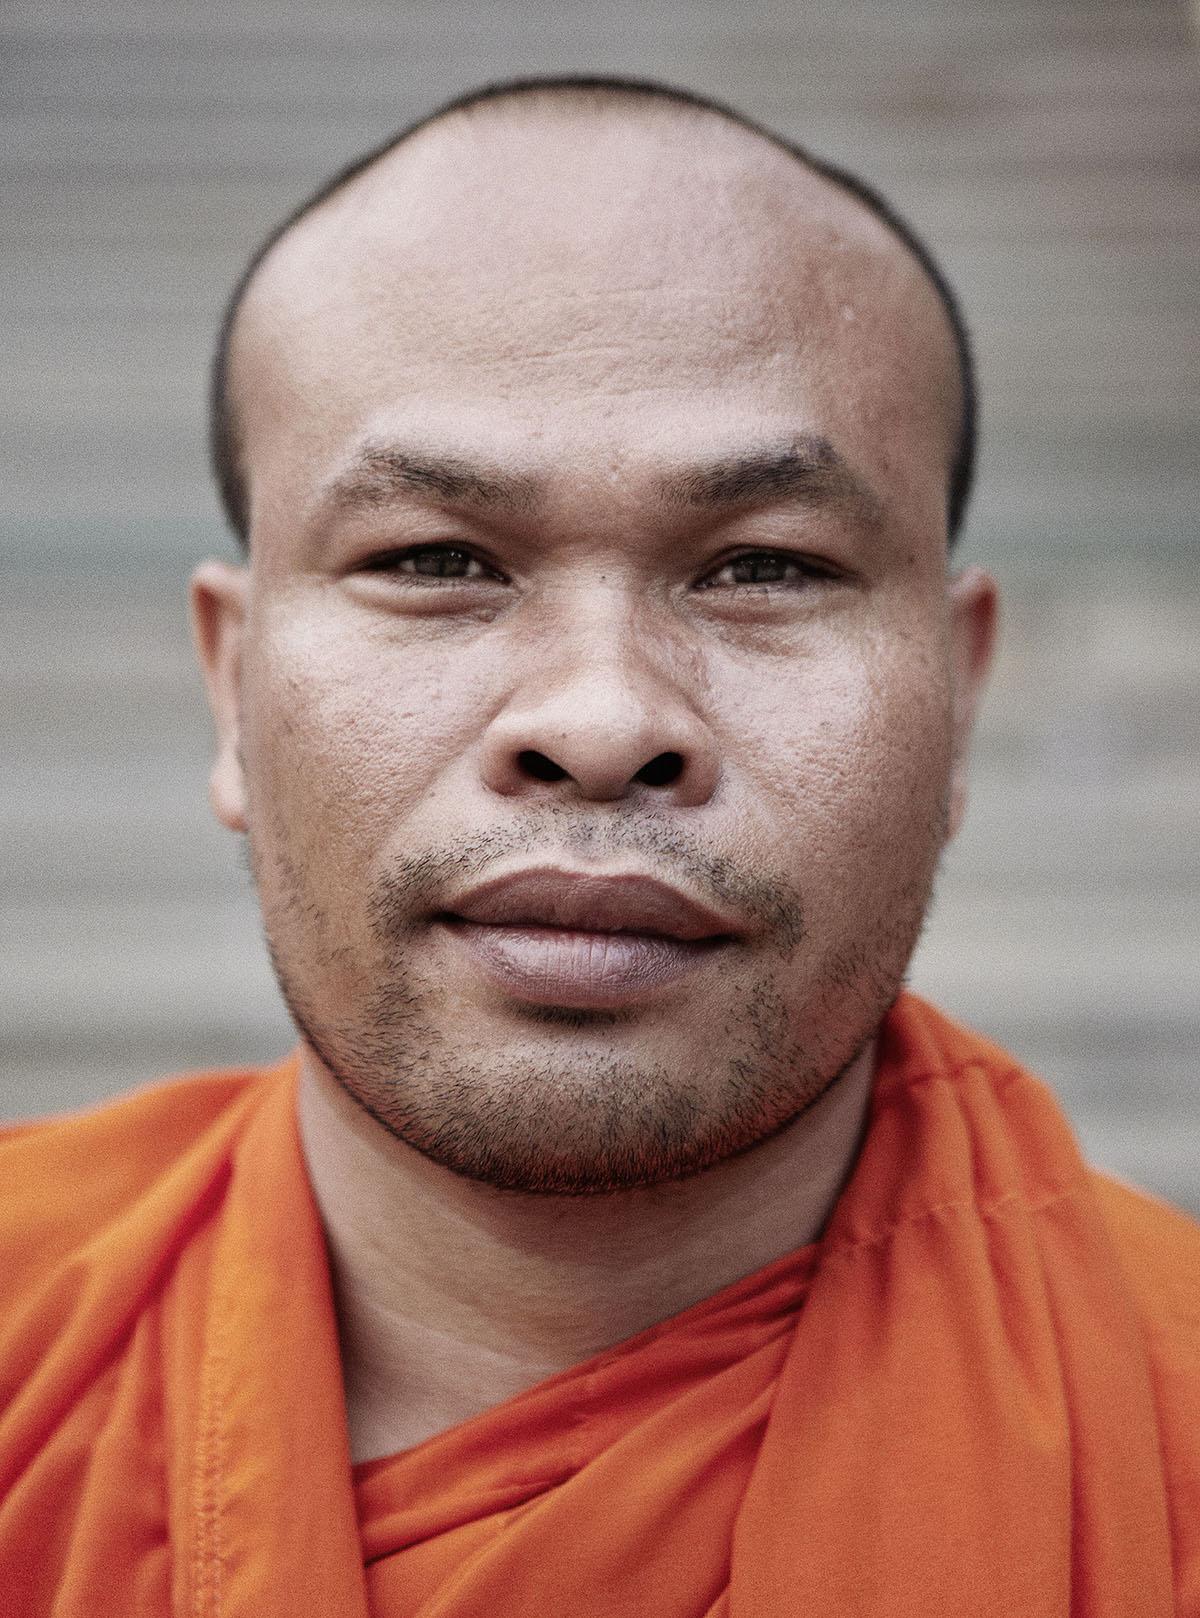 Portrait_Phnom Penh_03.jpg